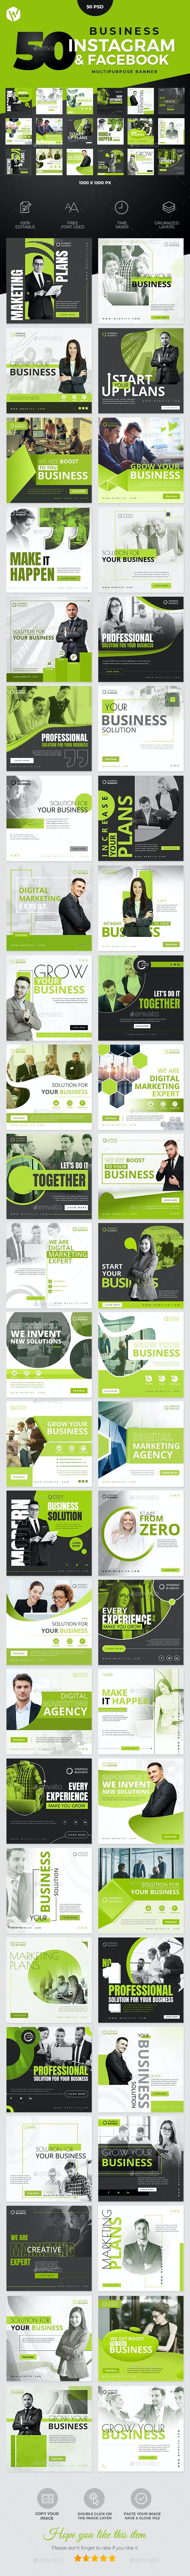 50 Instagram & Facebook Business Banners - Social Media Web Elements